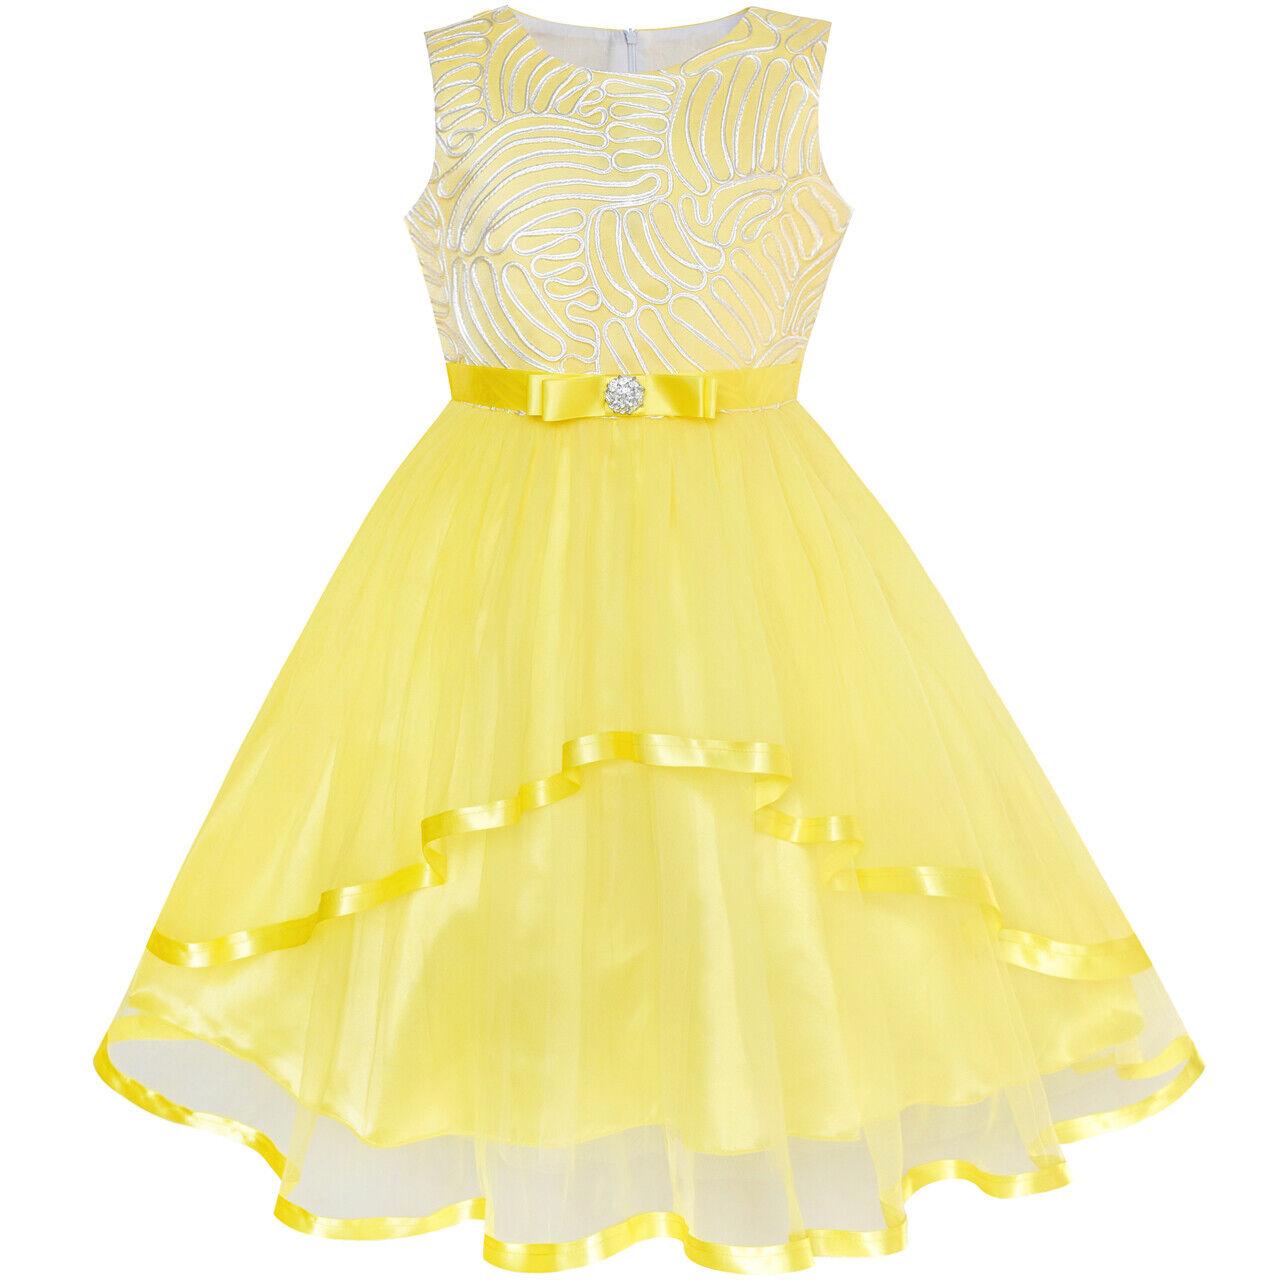 Flower Dress Yellow Belted Wedding